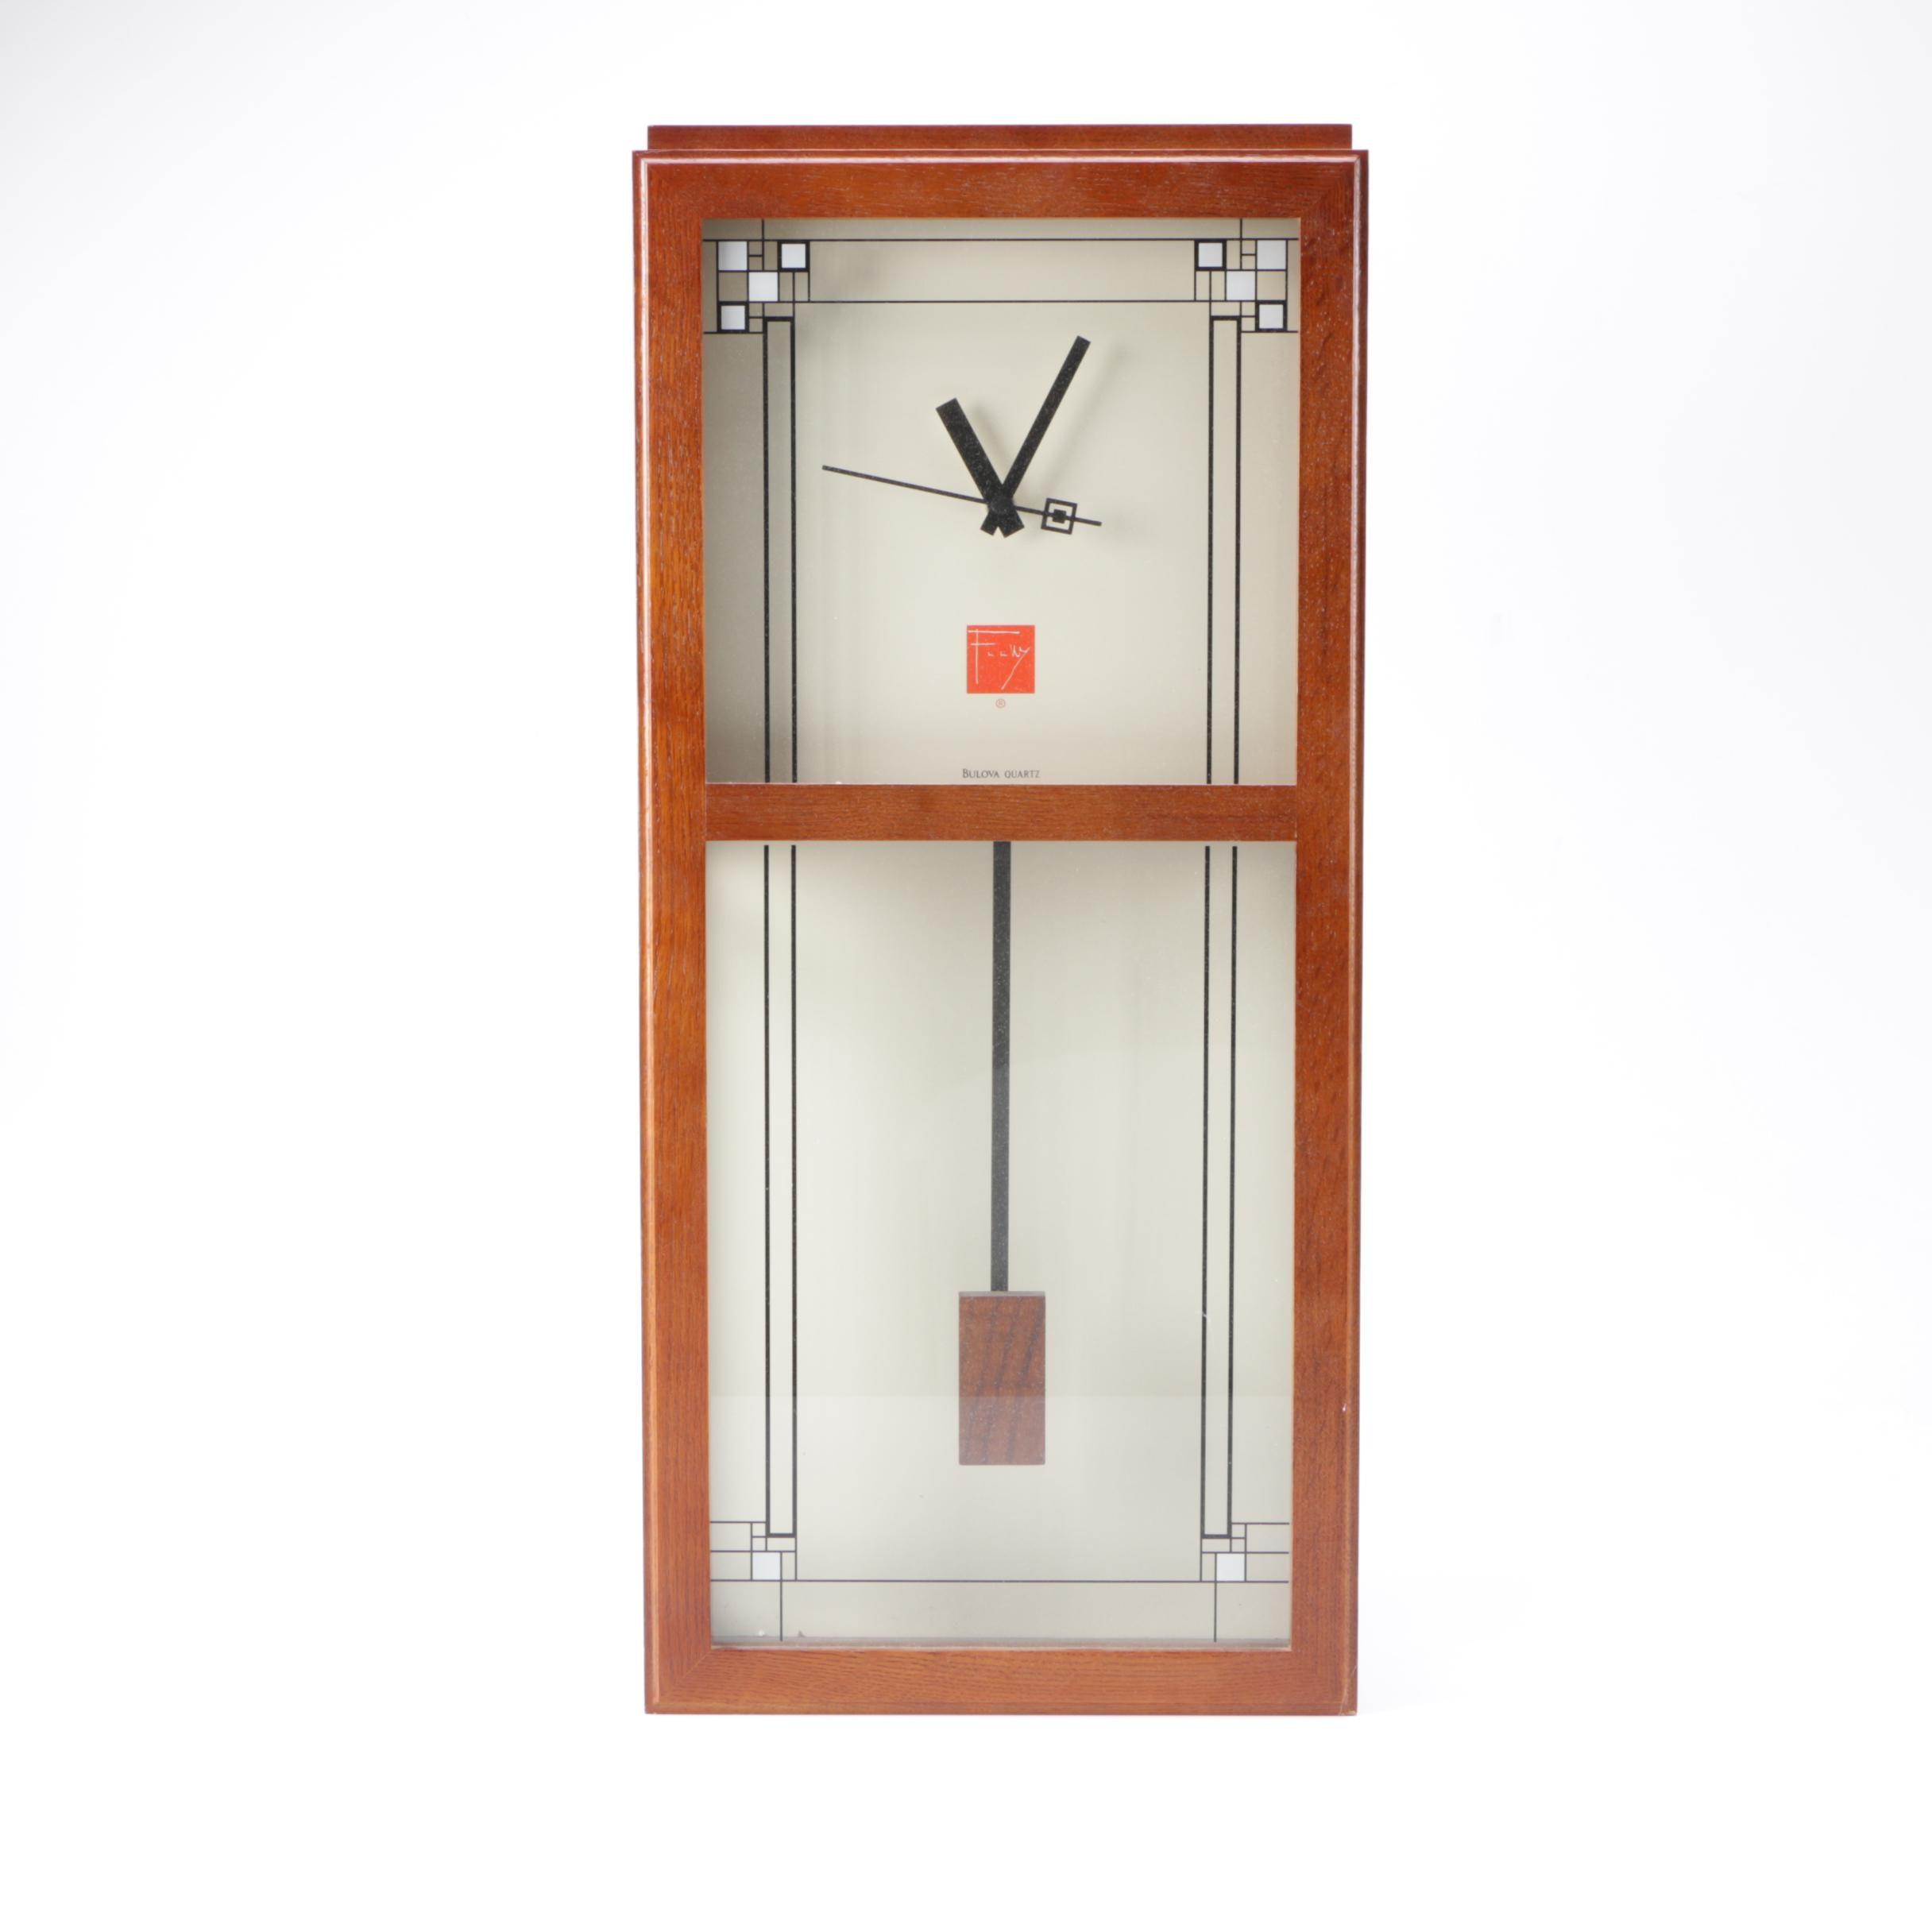 Bulova Quartz Frank Lloyd Wright Clock